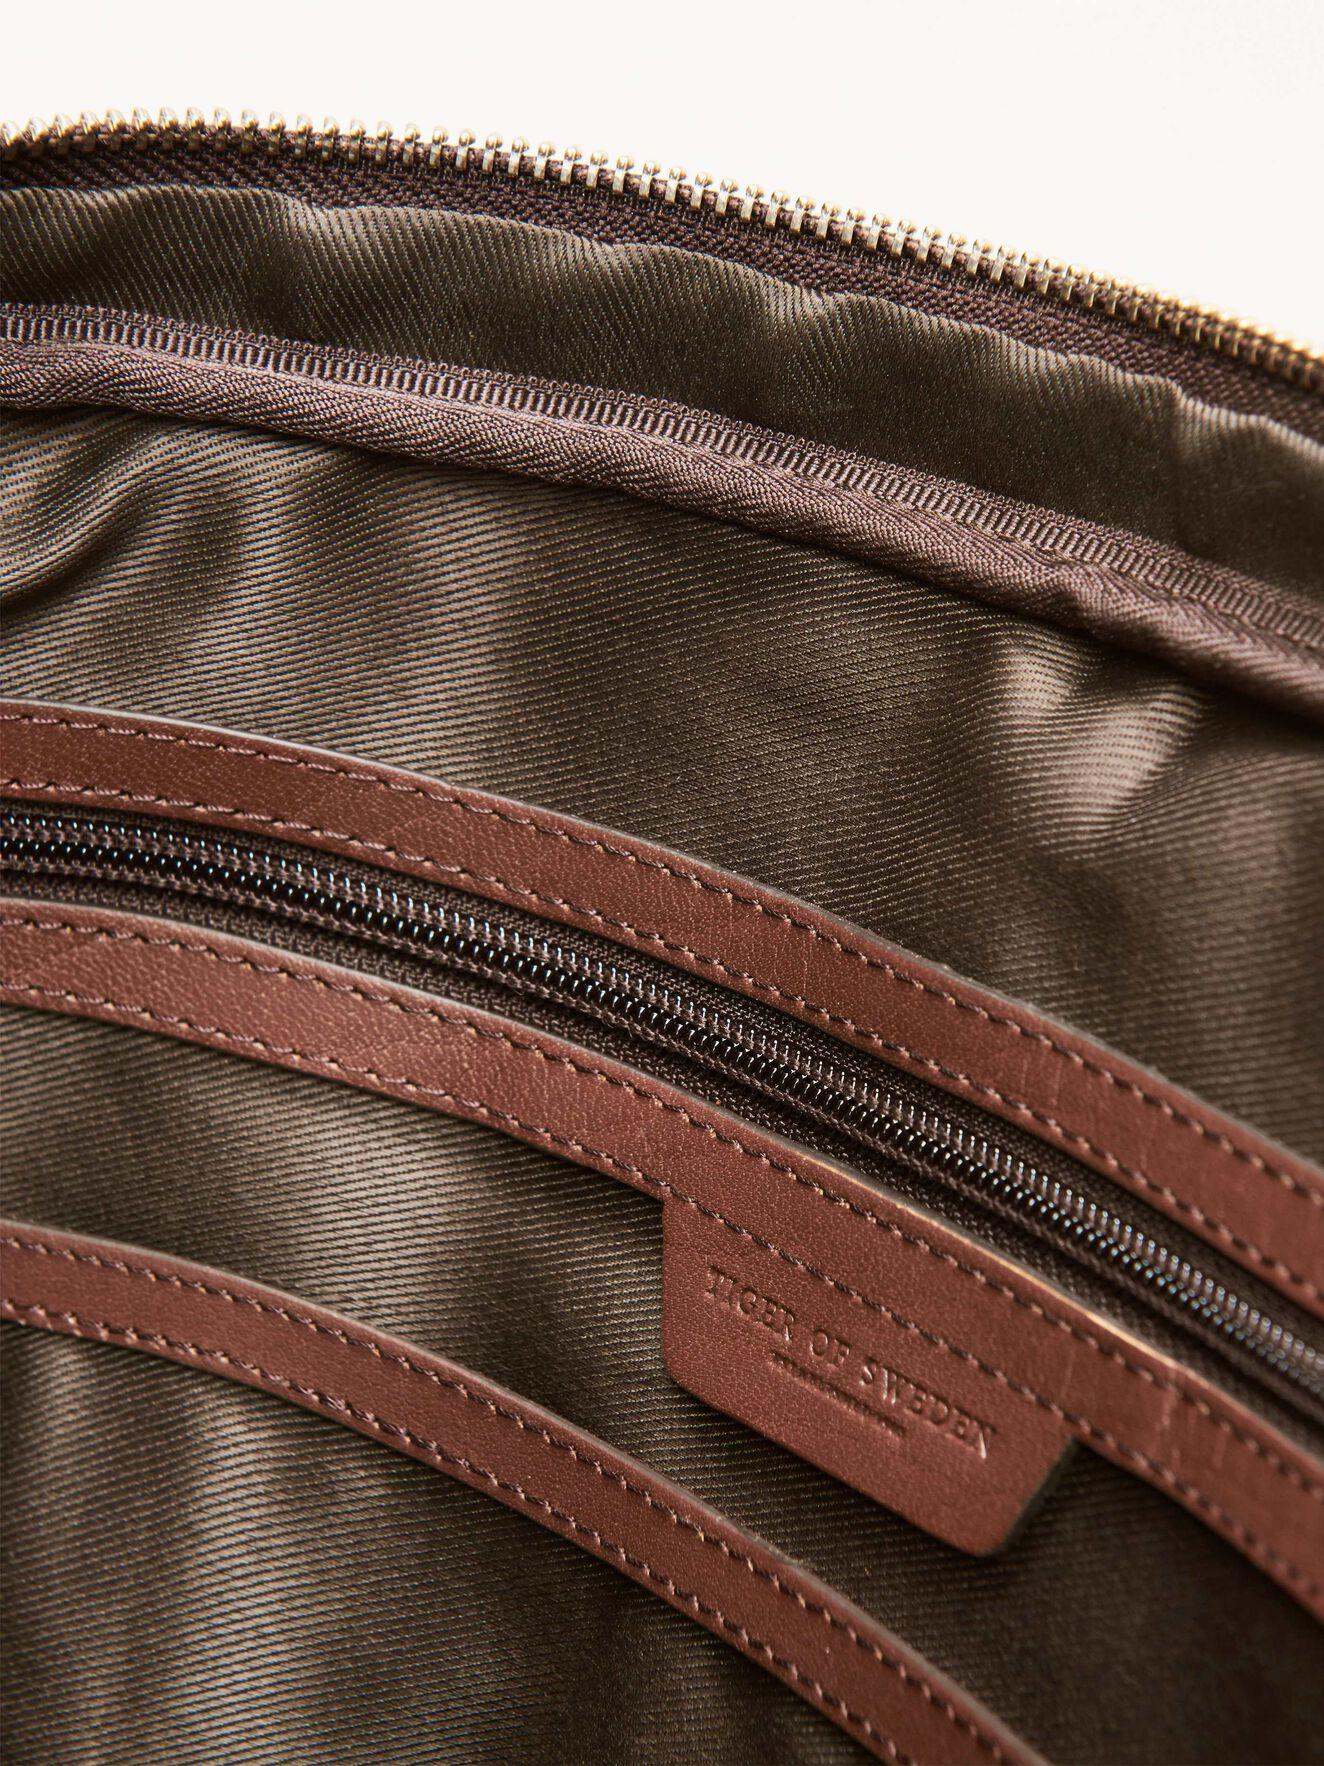 Marquet Briefcase in Medium Brown from Tiger of Sweden